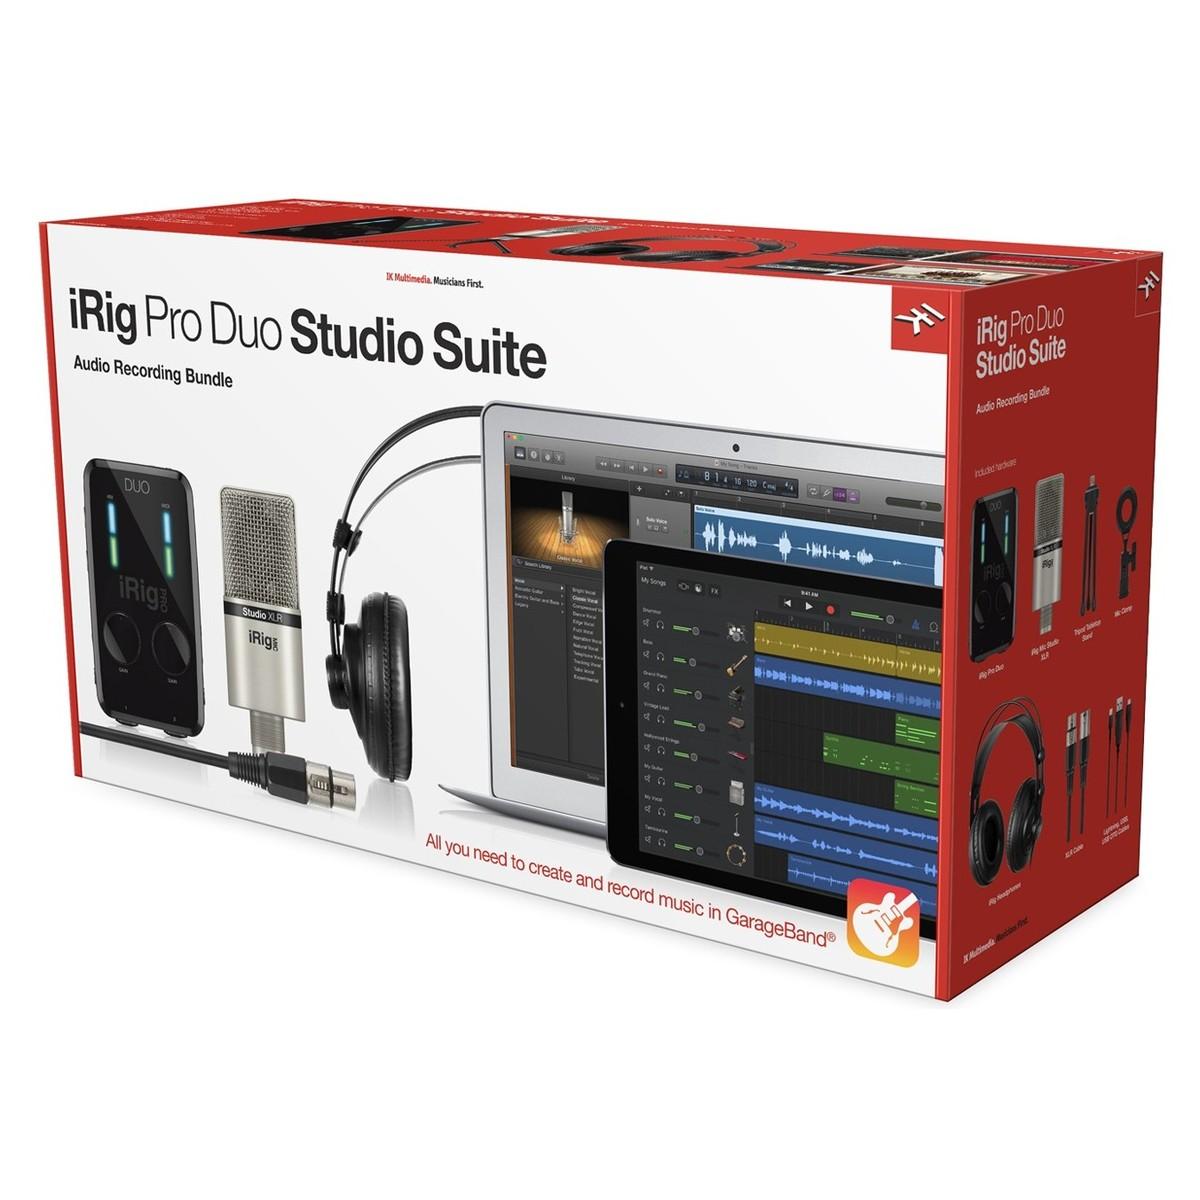 Ik multimedia release irig pro duo suite bundles for Salon multimedia